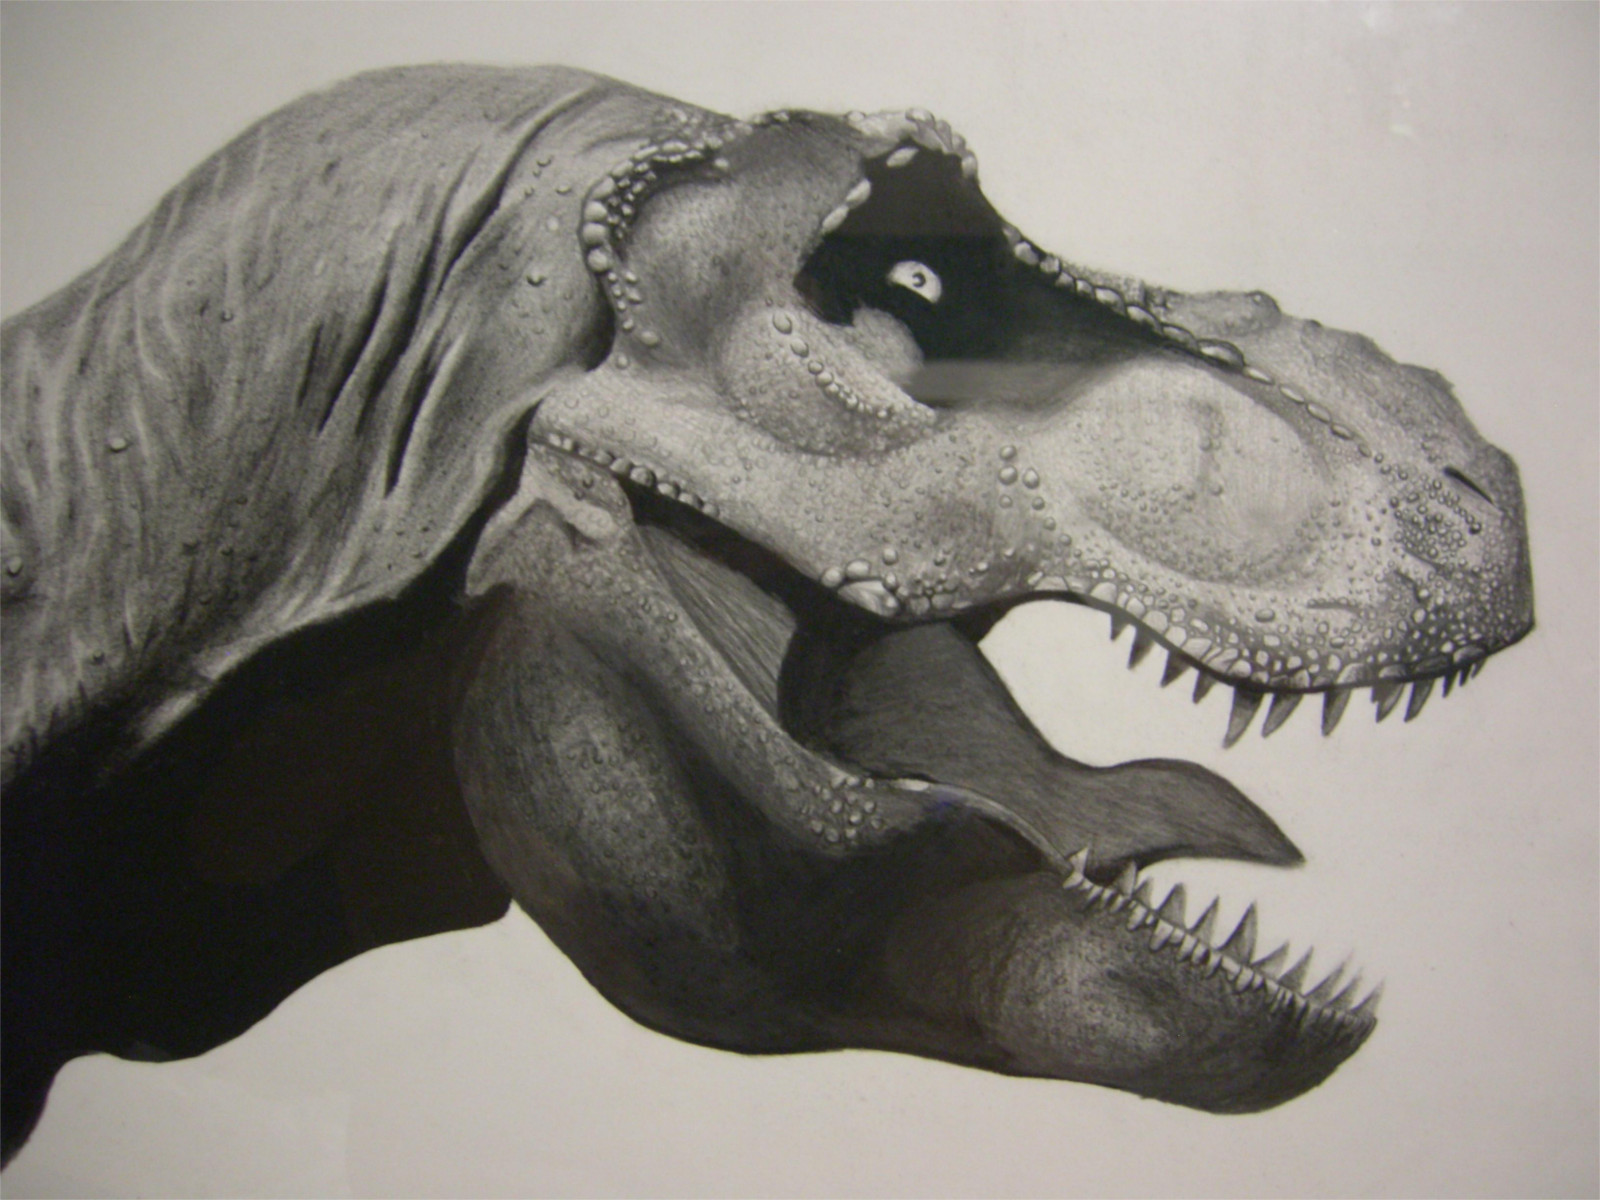 Dinosaur Blood?